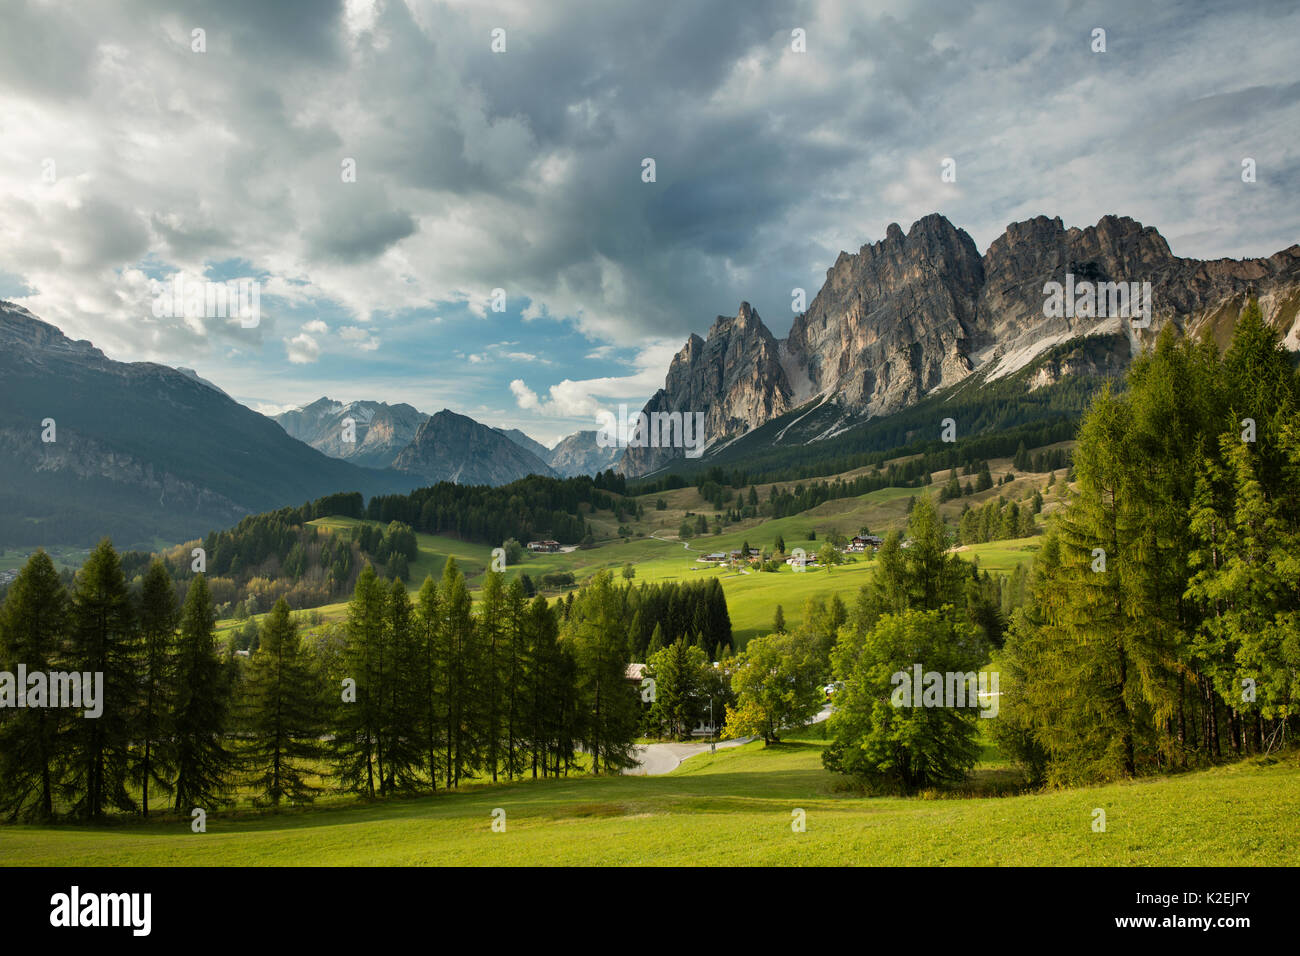 Pomagaonon above Cortina d'Ampezzo, Dolomite Mountains,  Belluno Province, Veneto, Italy, September 2015. - Stock Image